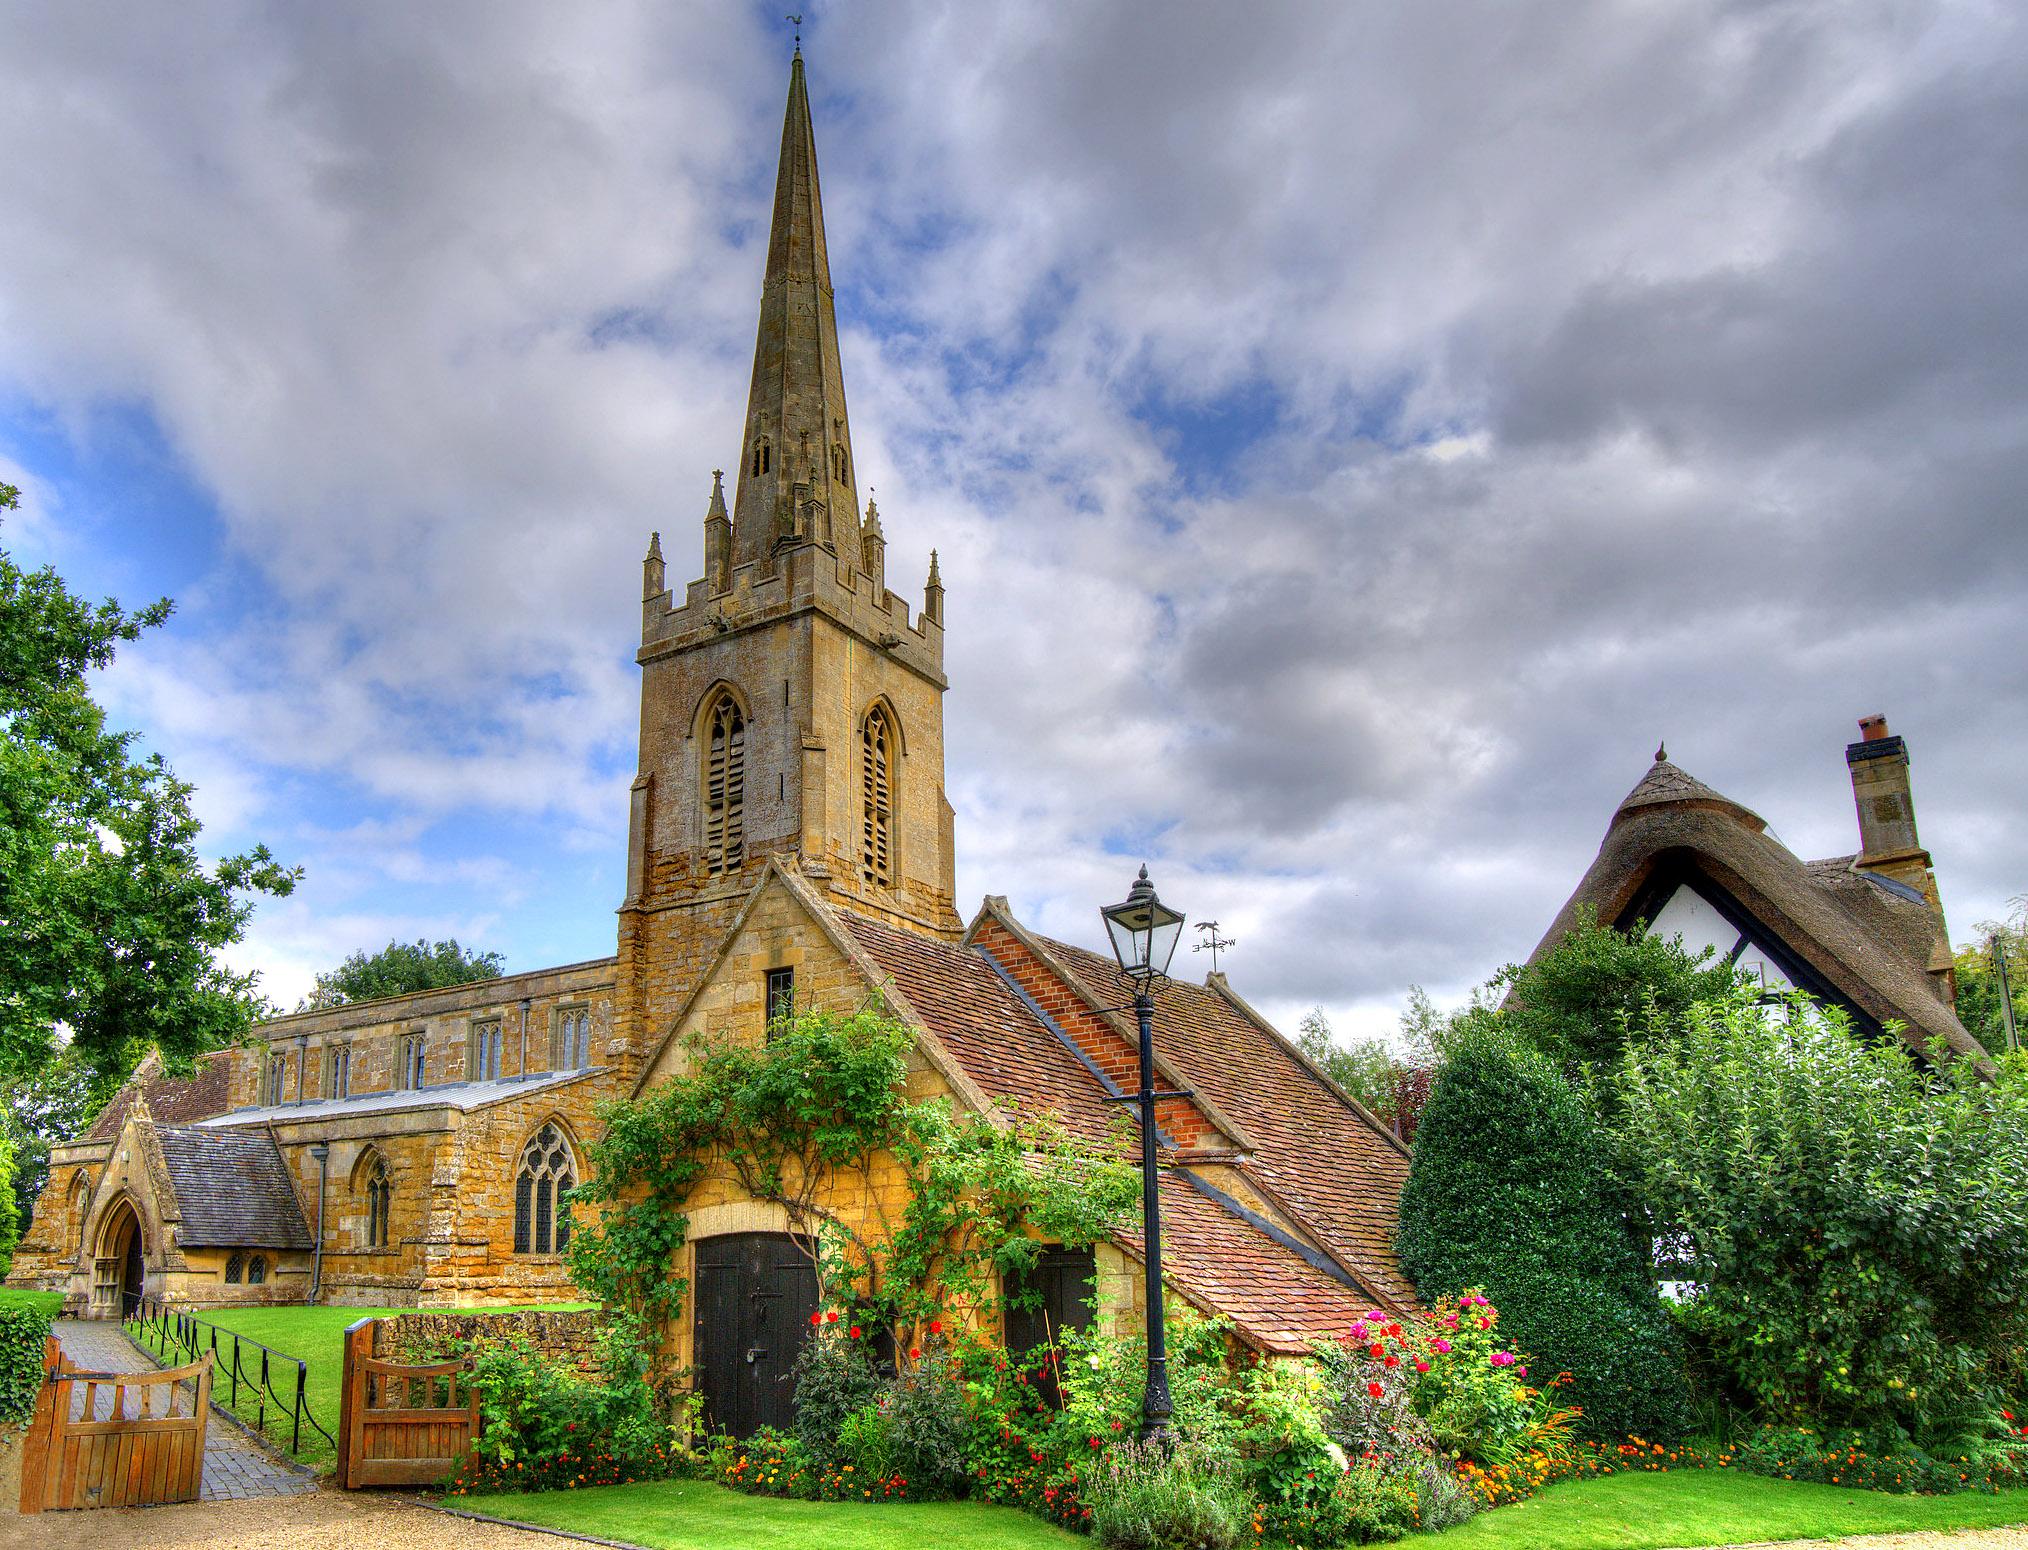 Church of St Swithin, Lower Quinton, Warwickshire by Howard Somerville.jpg